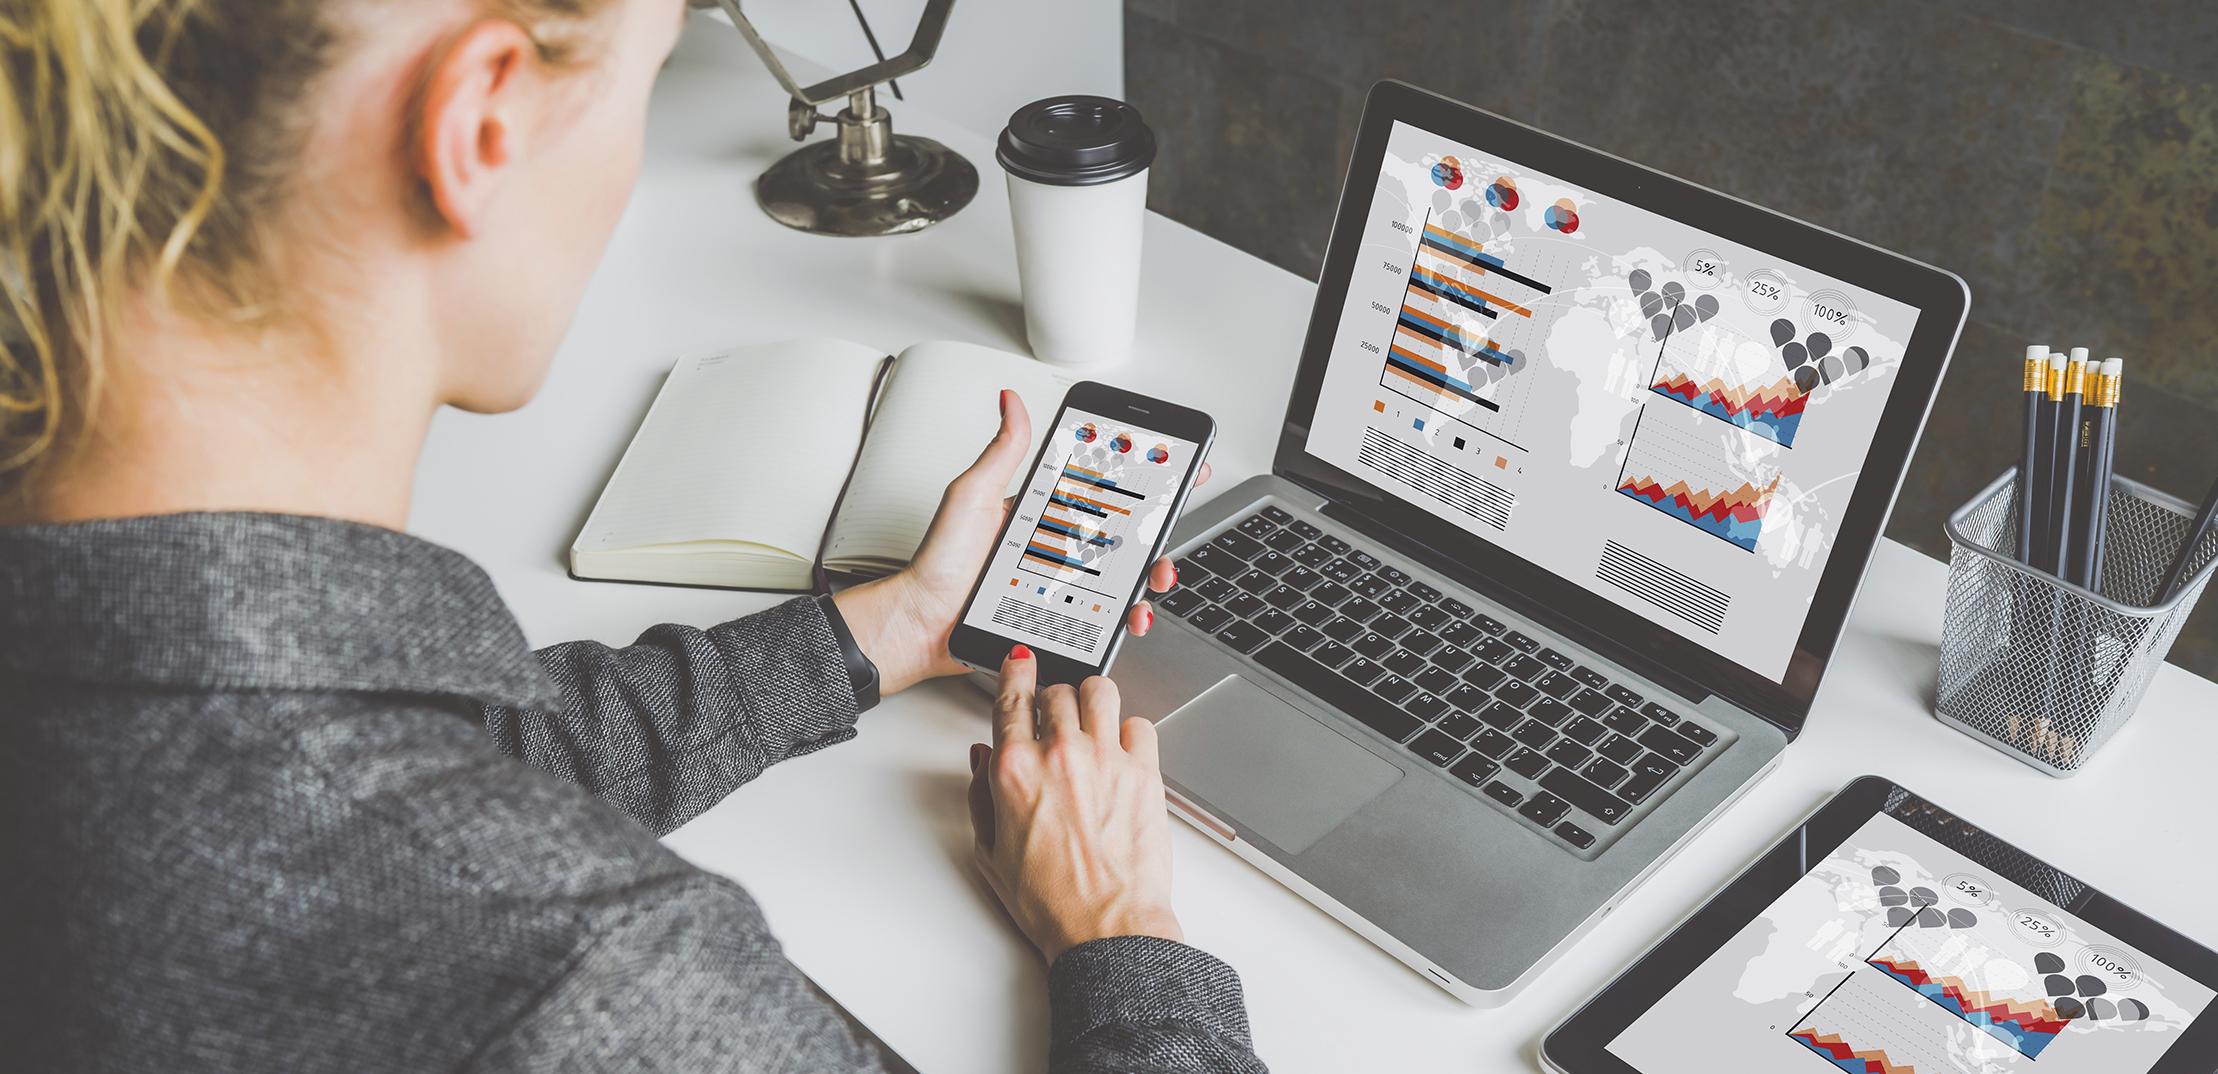 using mobile workforce management SaaS software solution